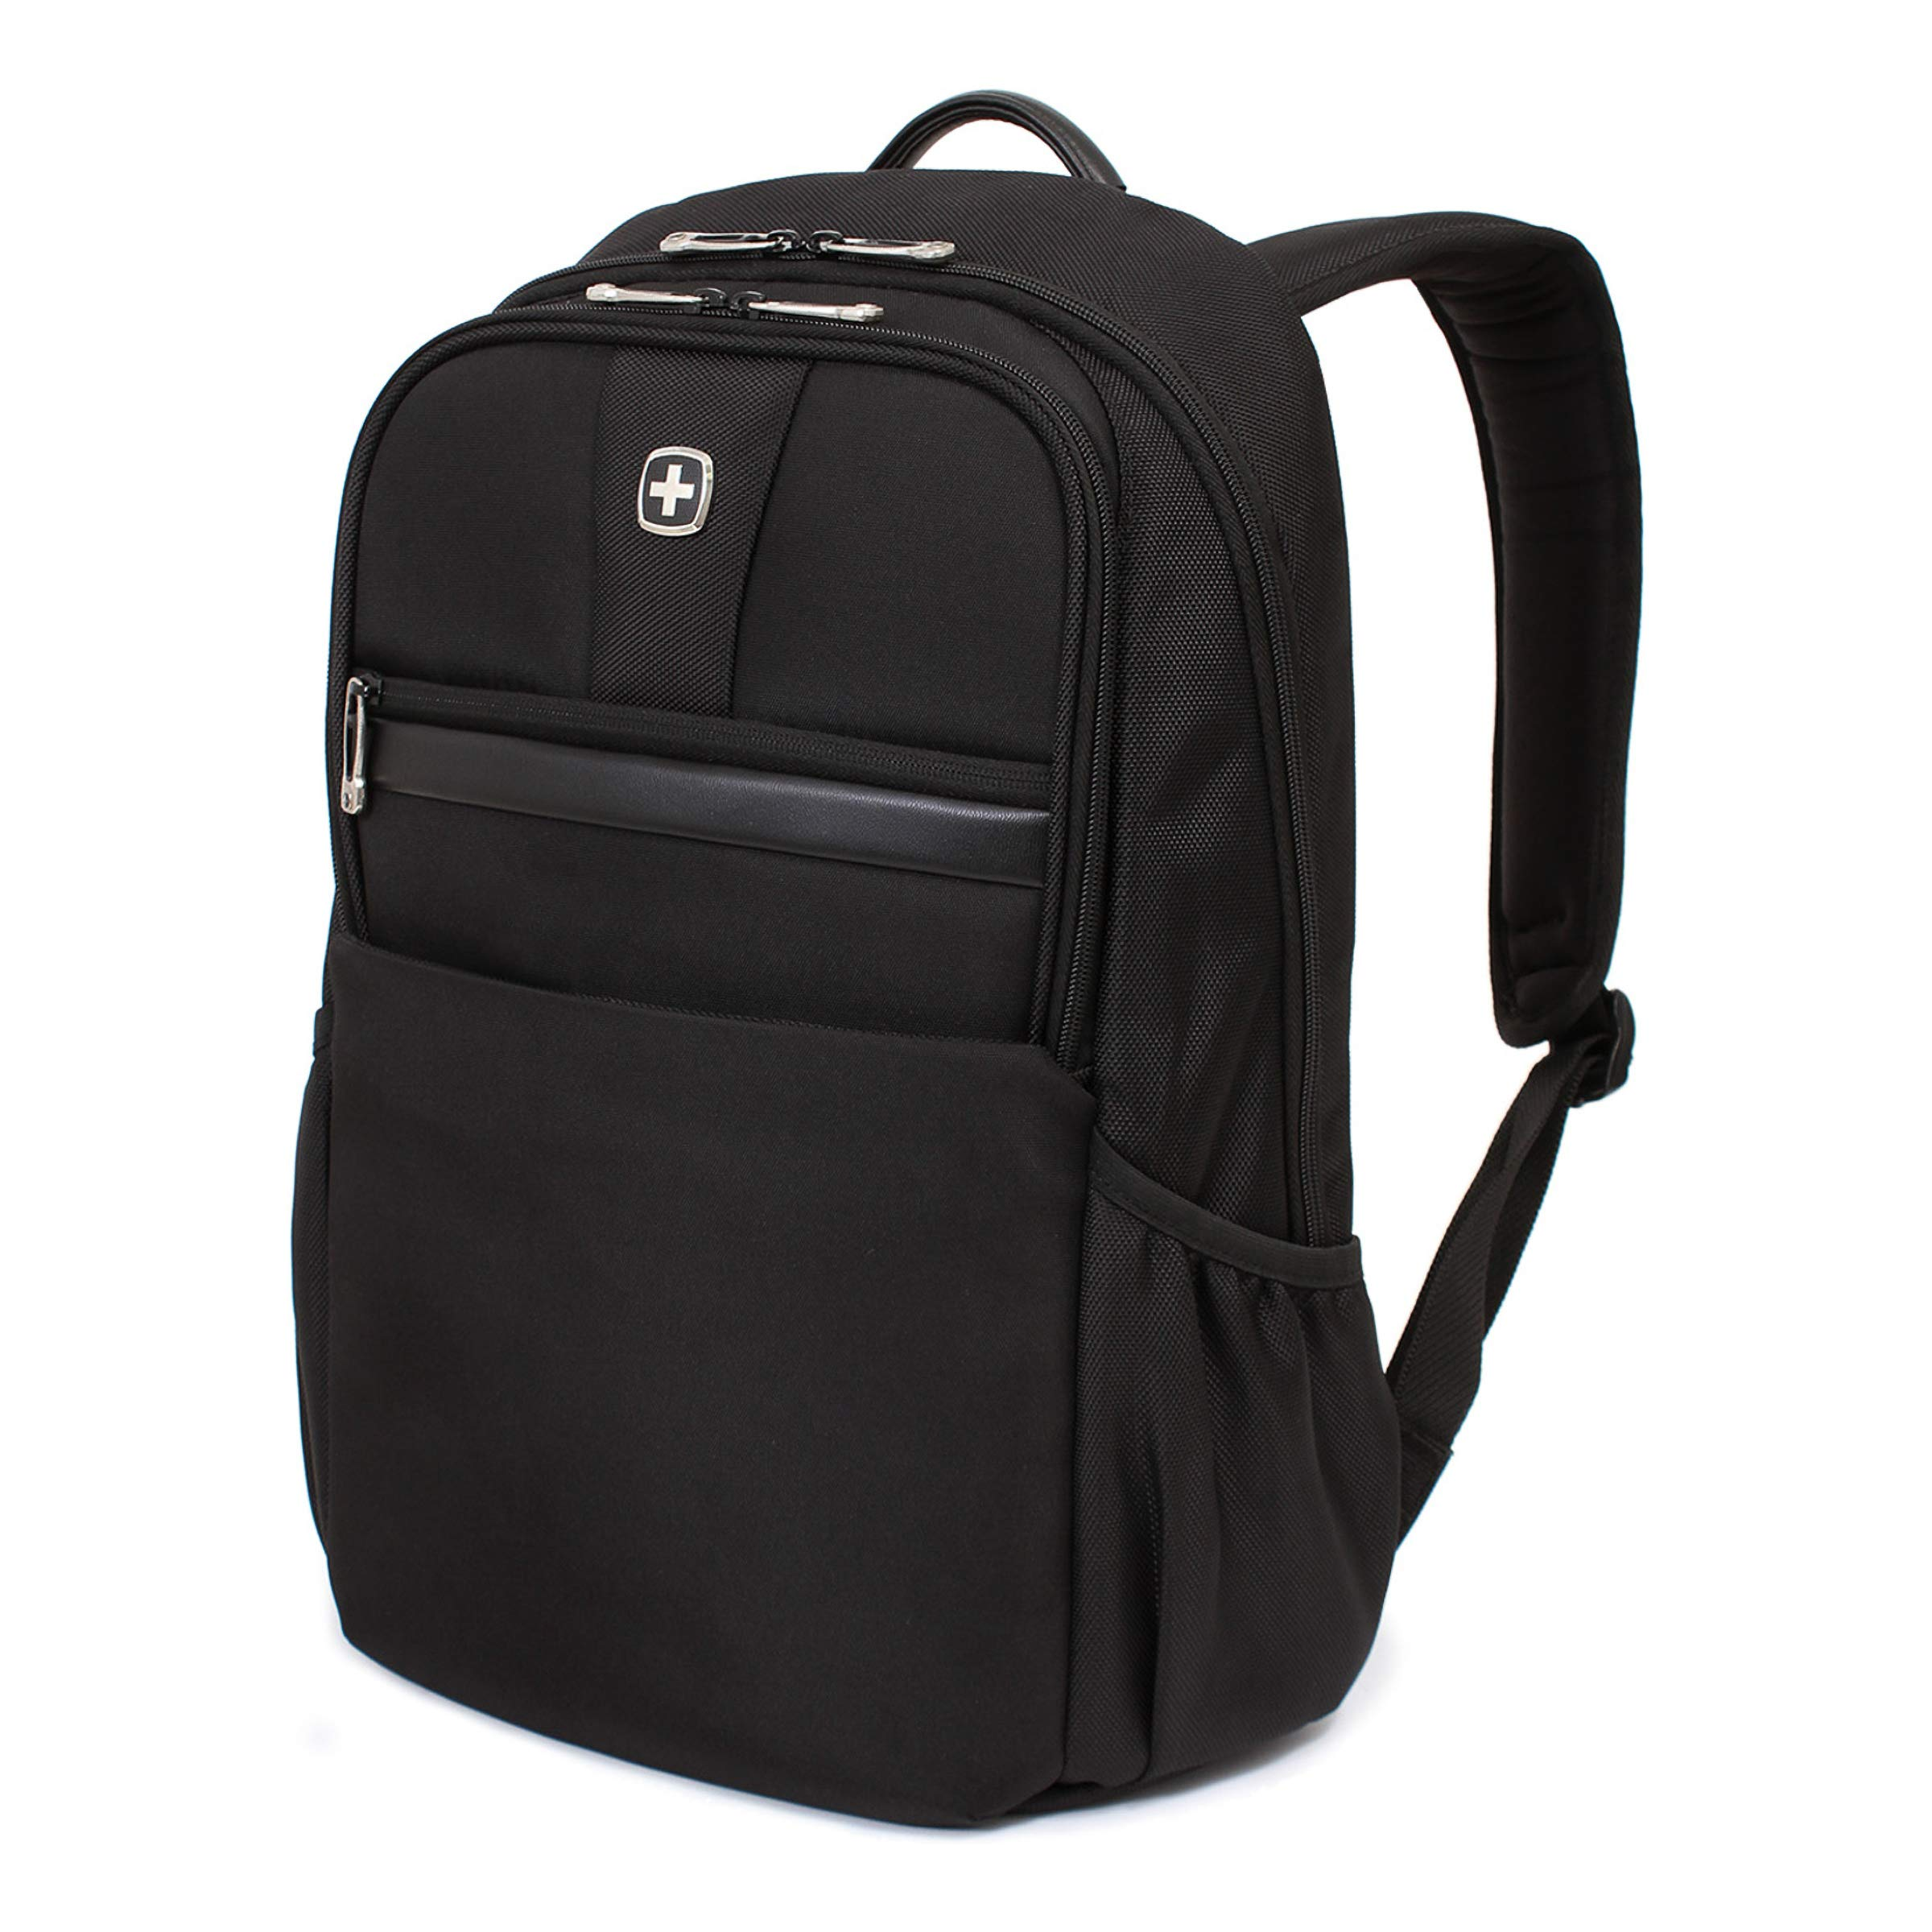 SWISSGEAR Durable 15-inch Laptop Backpack   Padded Computer Sleeve   Travel, Work, School   Men's and Women's - Black by Swiss Gear